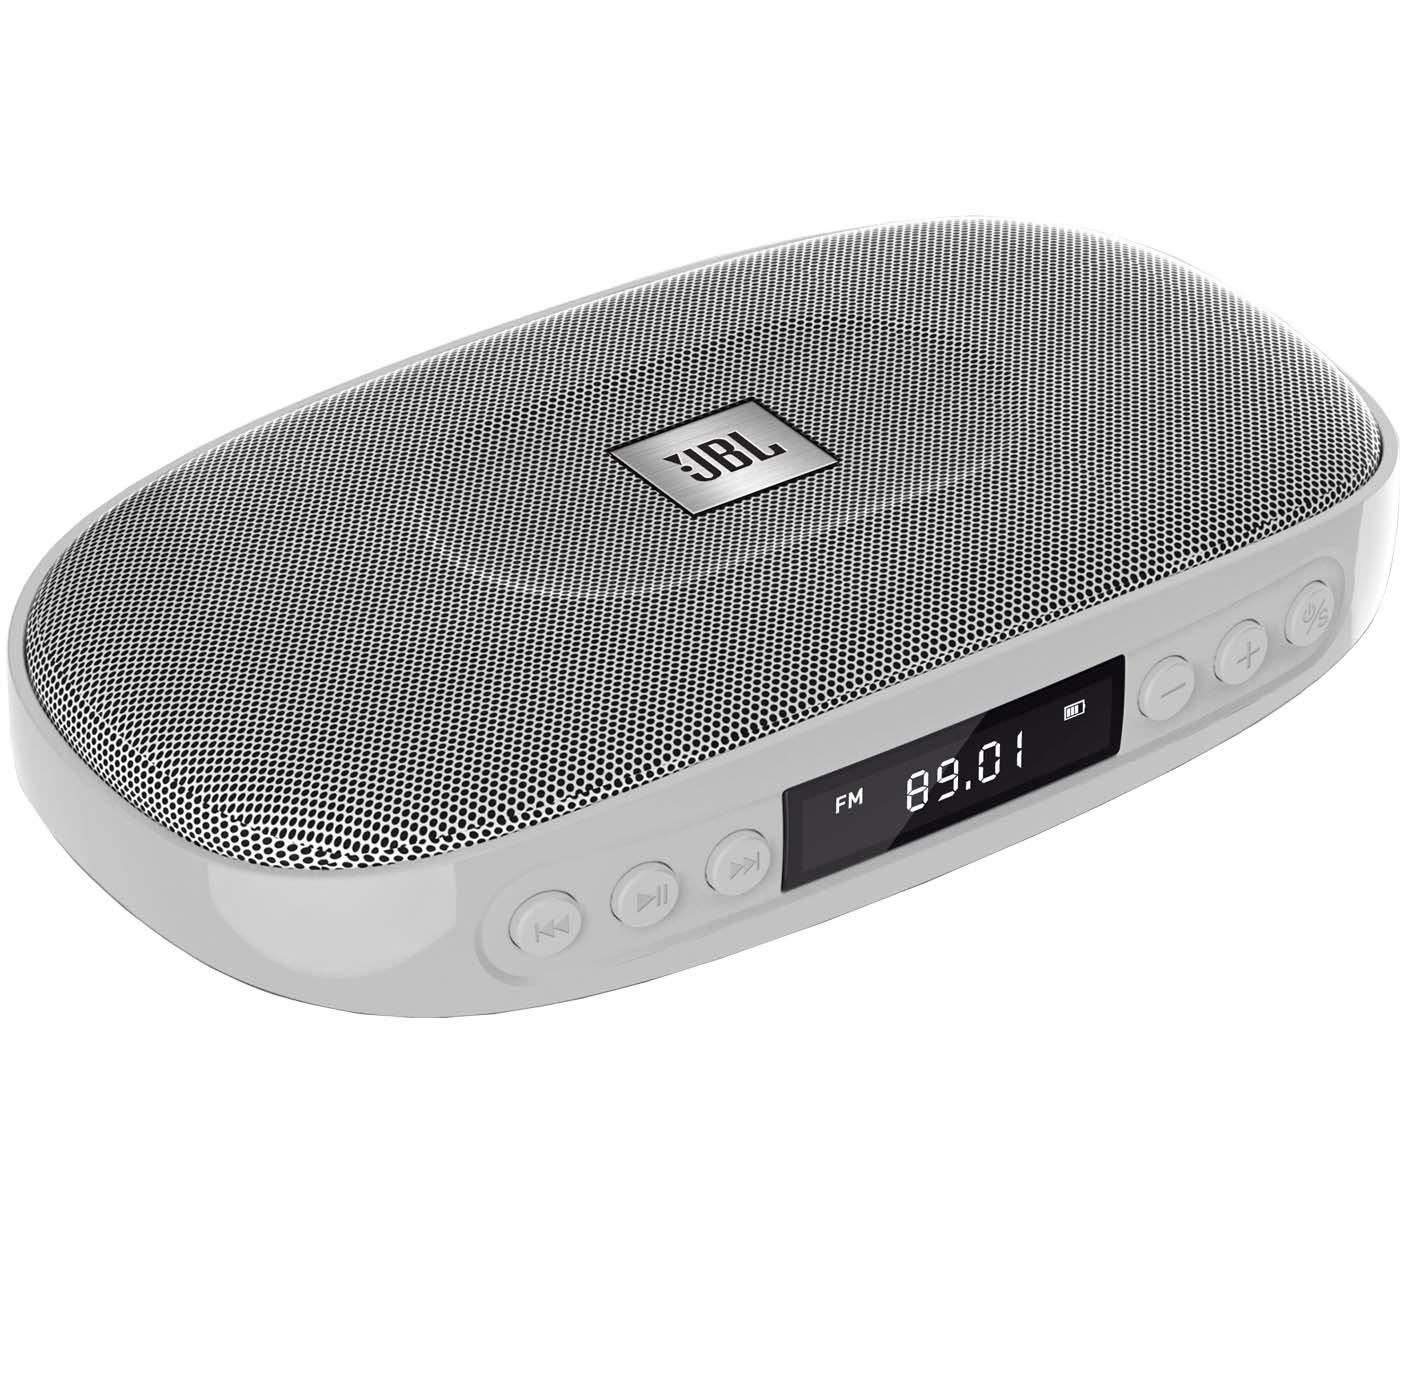 (Renewed) JBL Tune Wireless Bluetooth Speaker with SD Card reader  (JBLTUNESILVER, Silver)